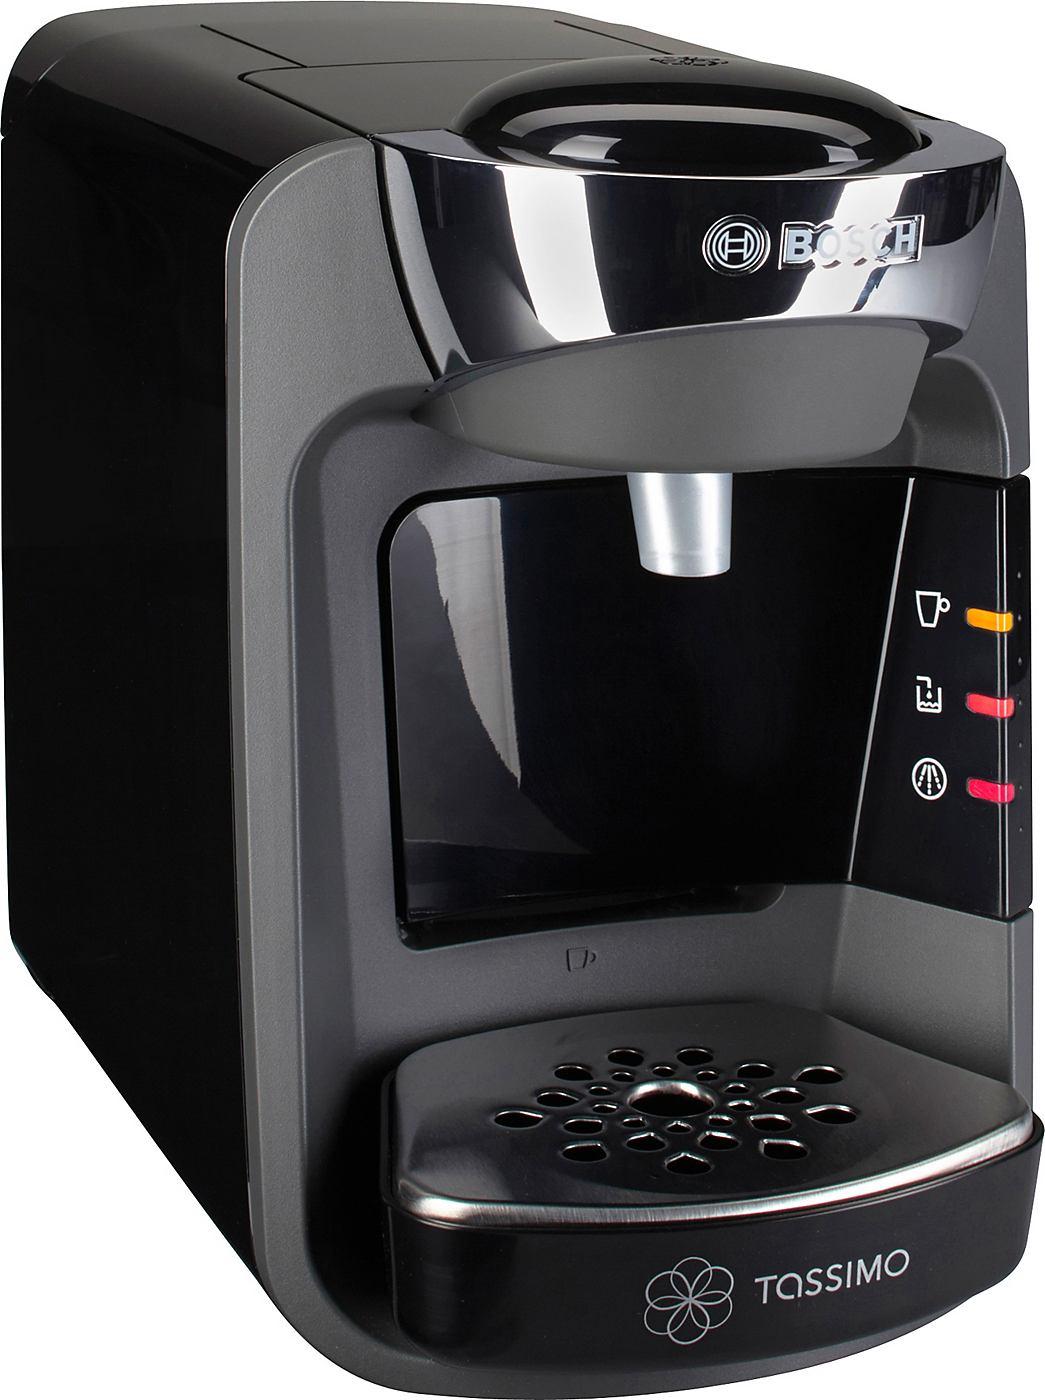 Bosch TASSIMO Multi-Getränke-Automat »Suny TAS3202«